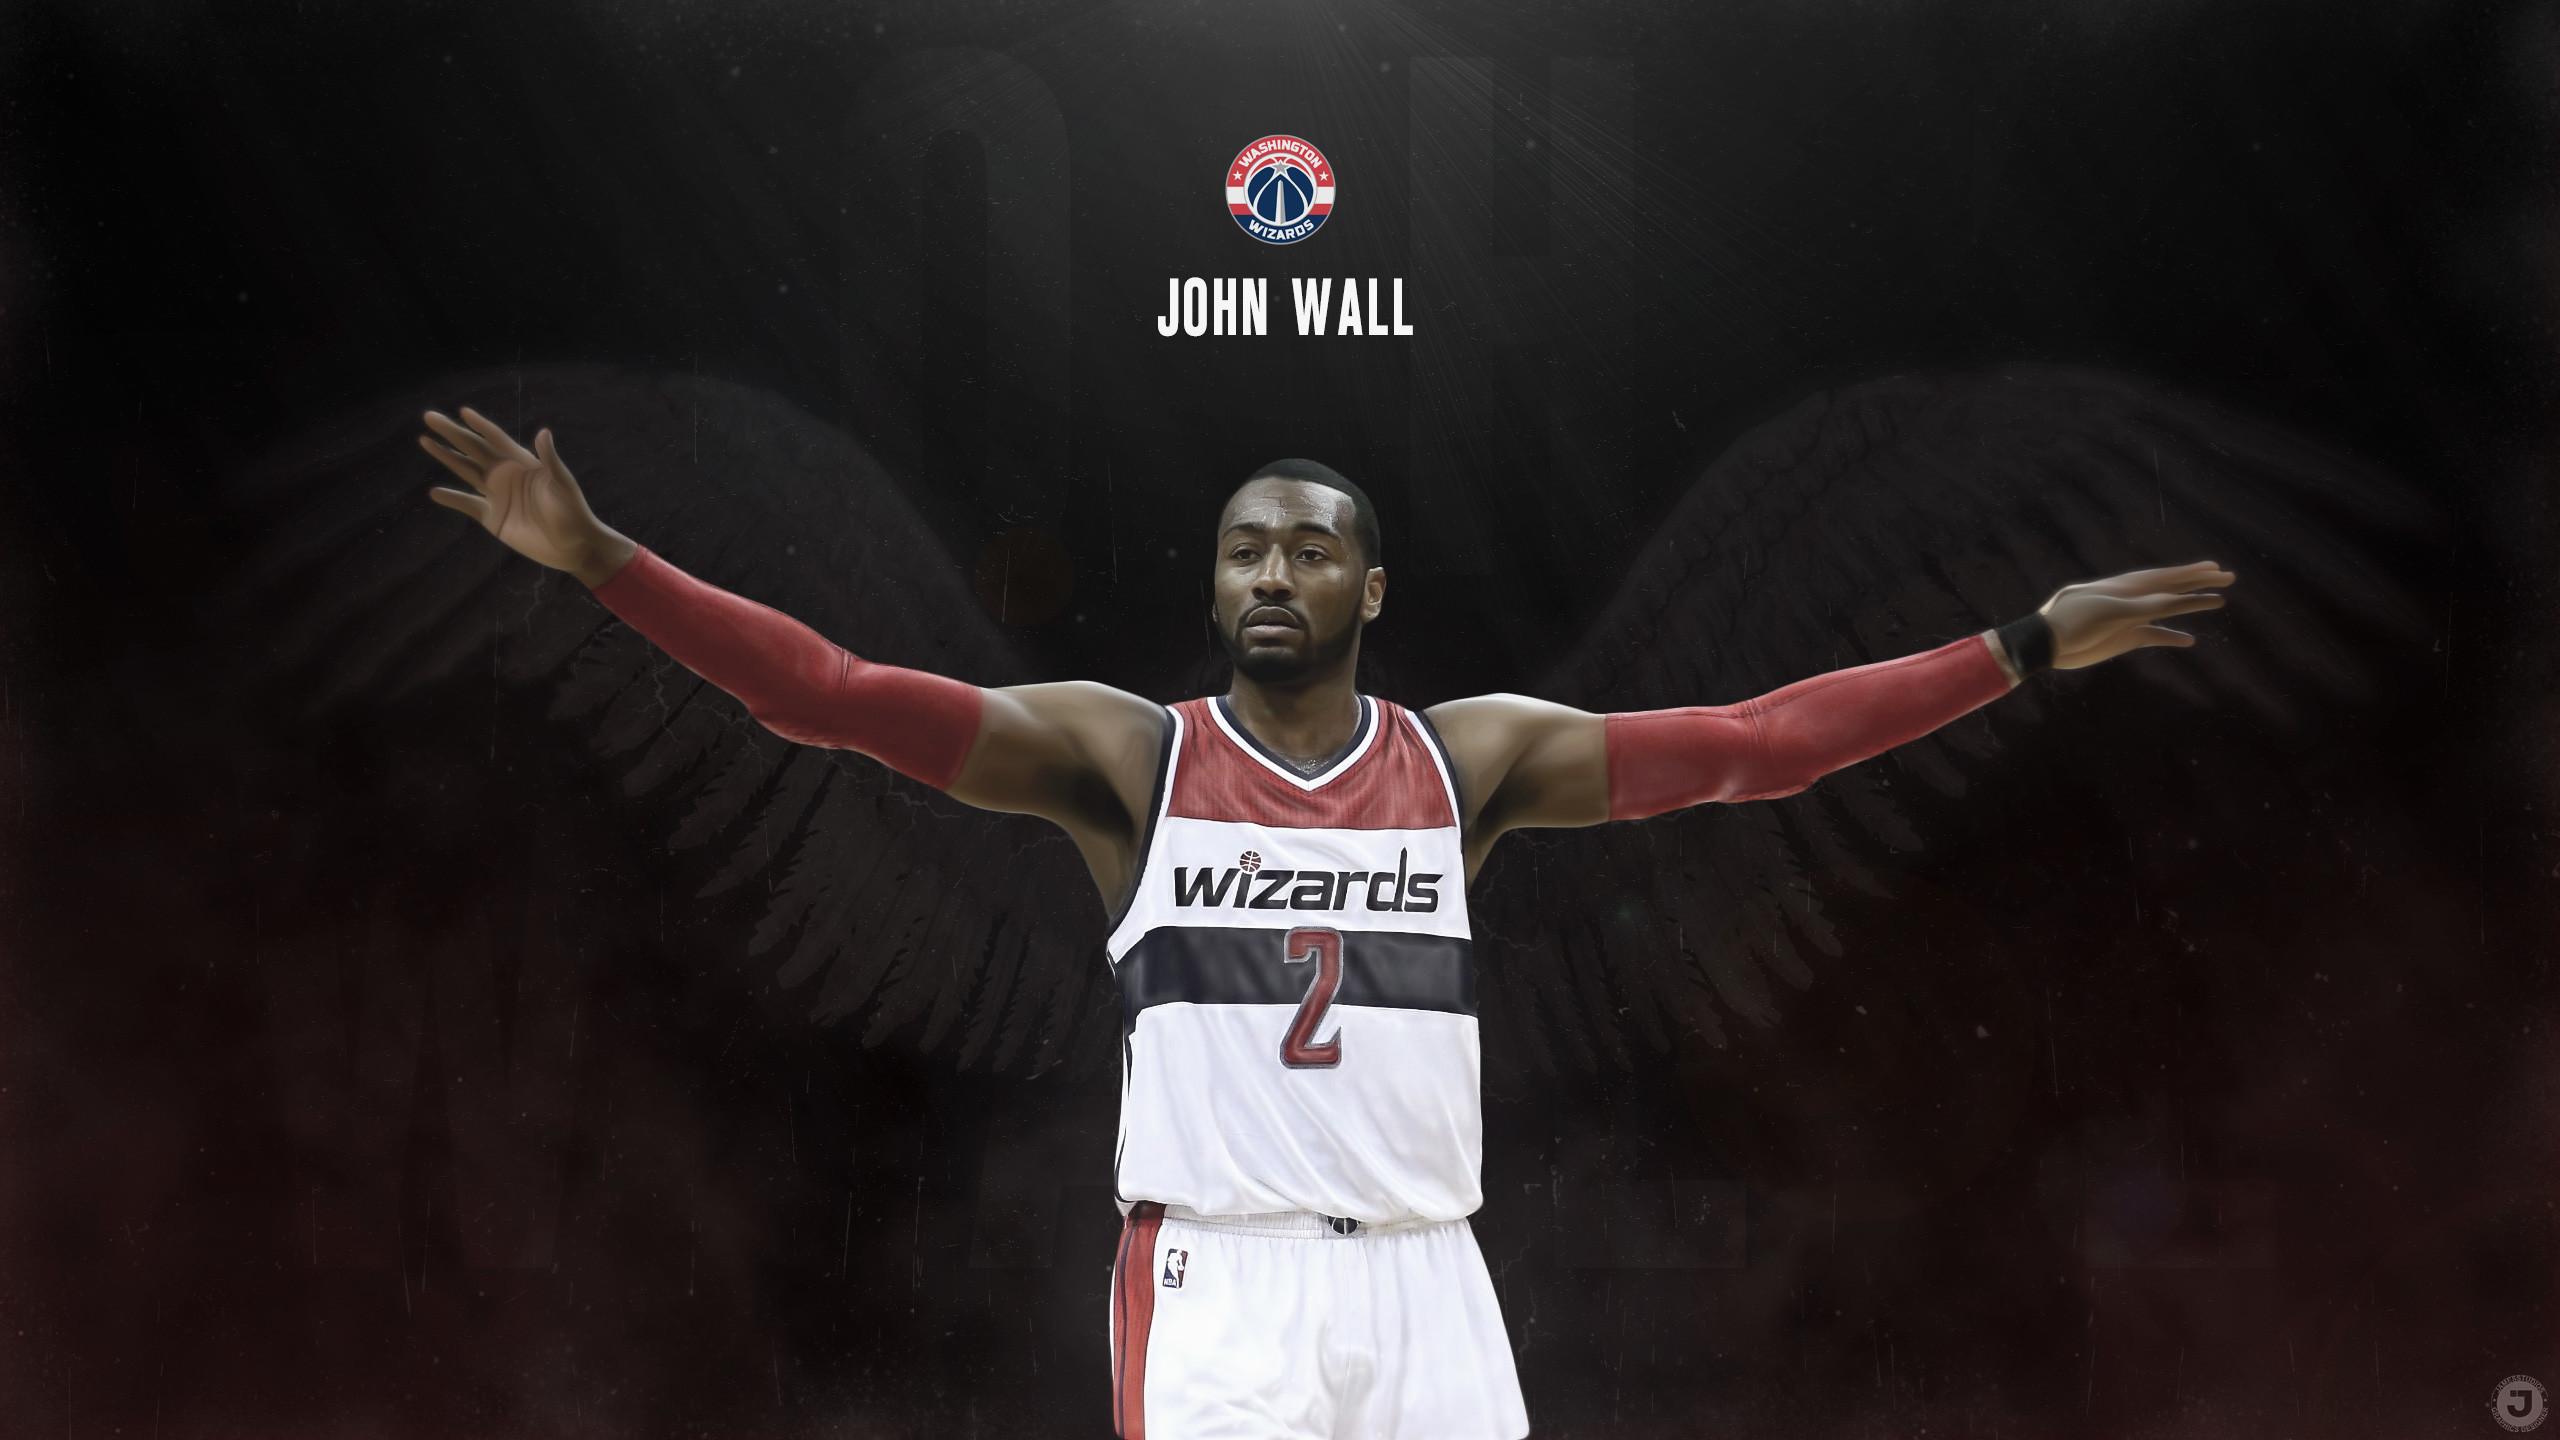 John Wall Wizards 2015 Wallpaper